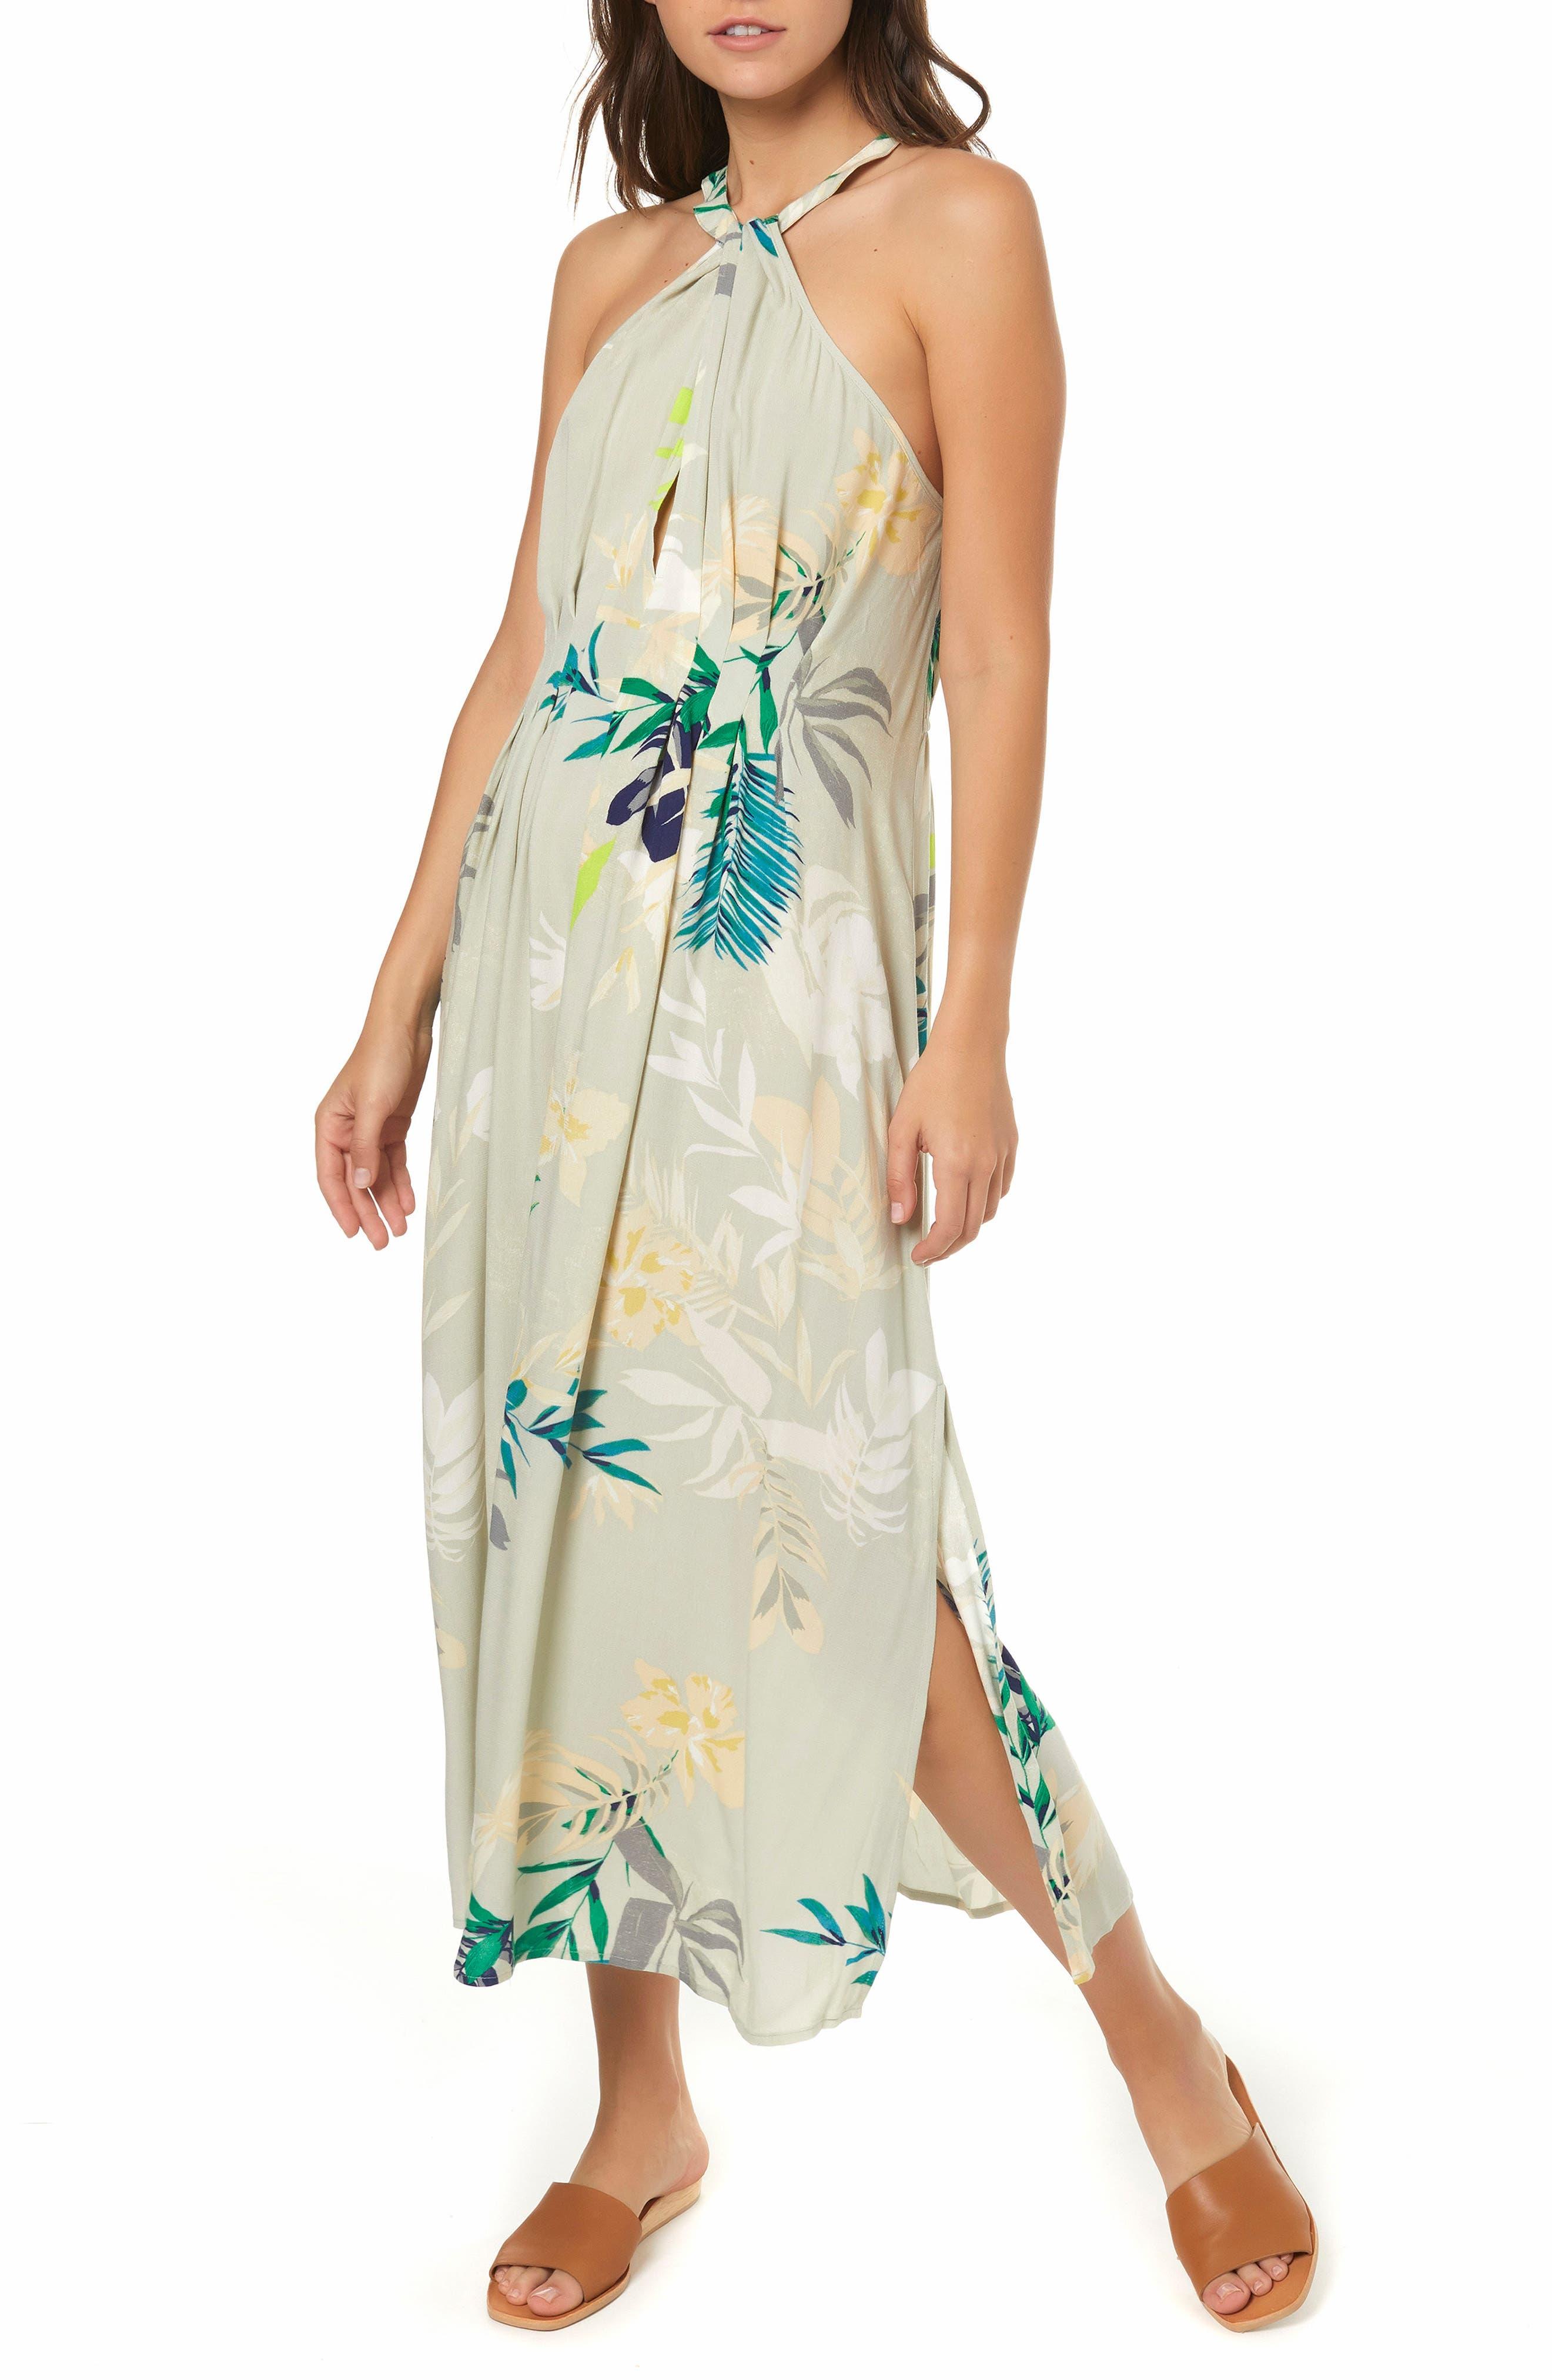 Byronne Floral Print Woven Midi Dress,                             Main thumbnail 1, color,                             MULTI COLORED